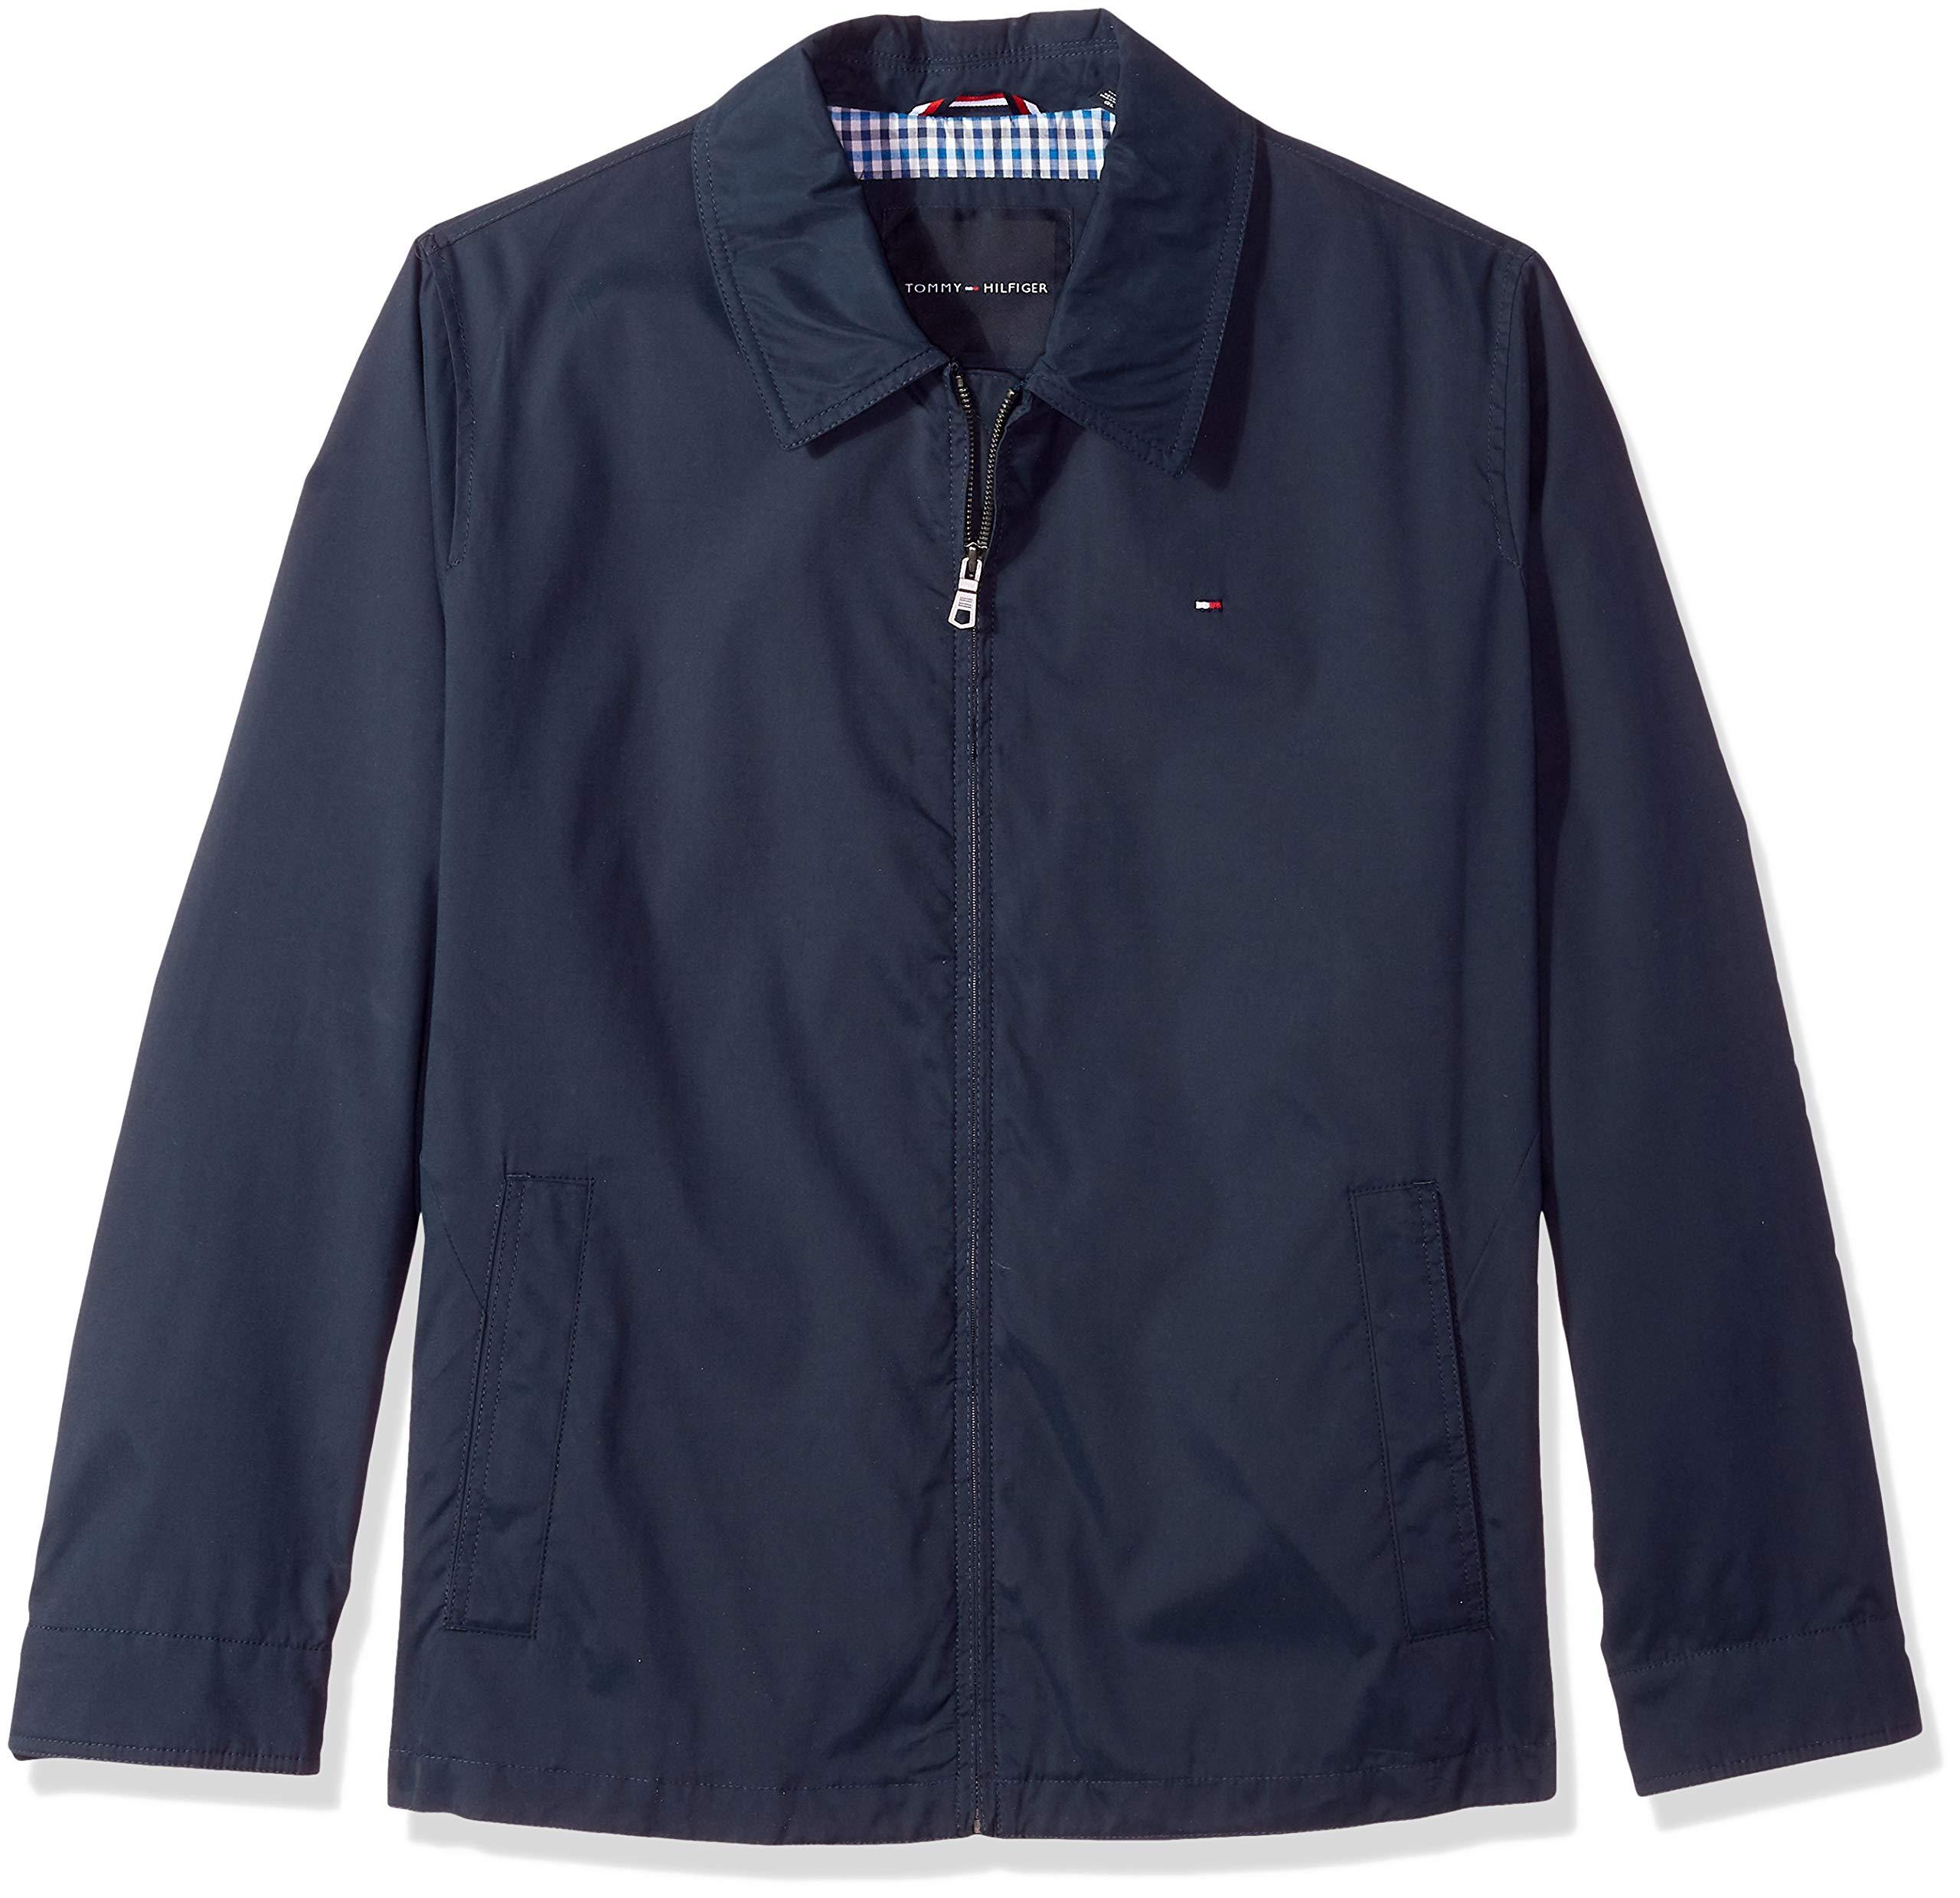 Tommy Hilfiger Men's Big Lightweight Microtwill Golf Jacket (Regular & Big-Tall Sizes), navy, LT by Tommy Hilfiger